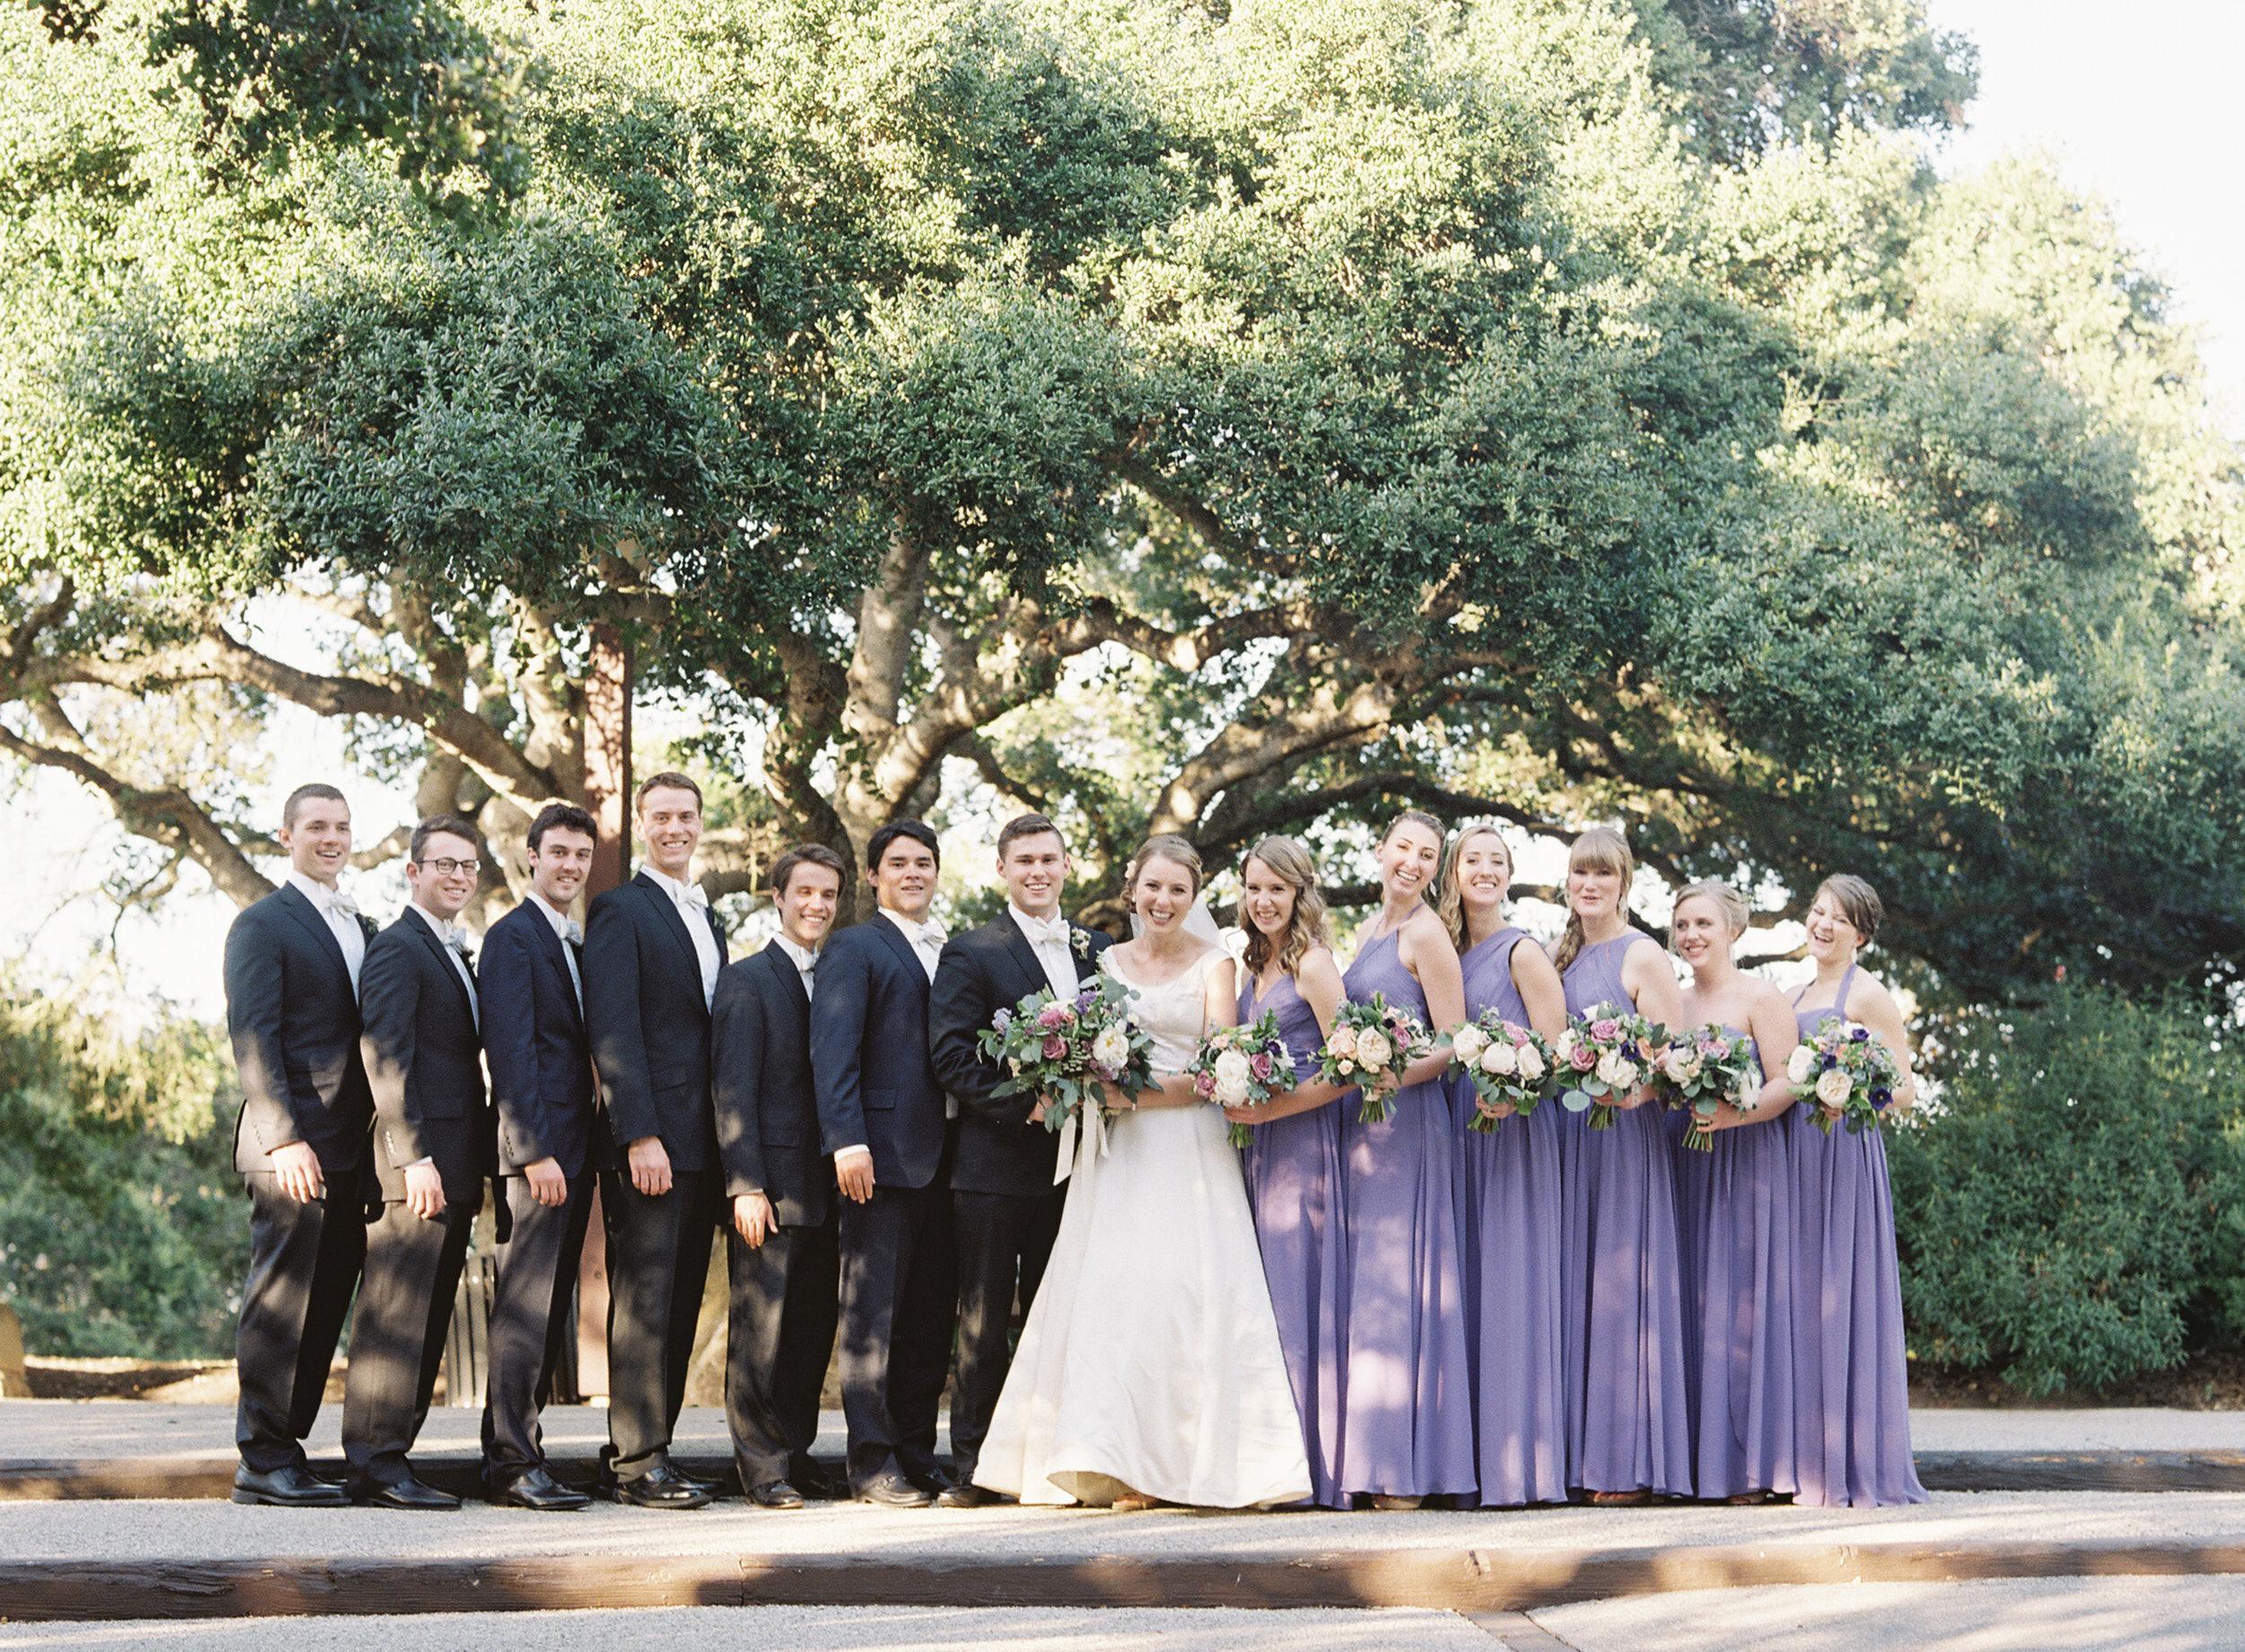 www.santabarbarawedding.com   Trinity Episcopal Church   Elings Park   Sarah Weir   Burlap & Bordeaux   Bridal Party